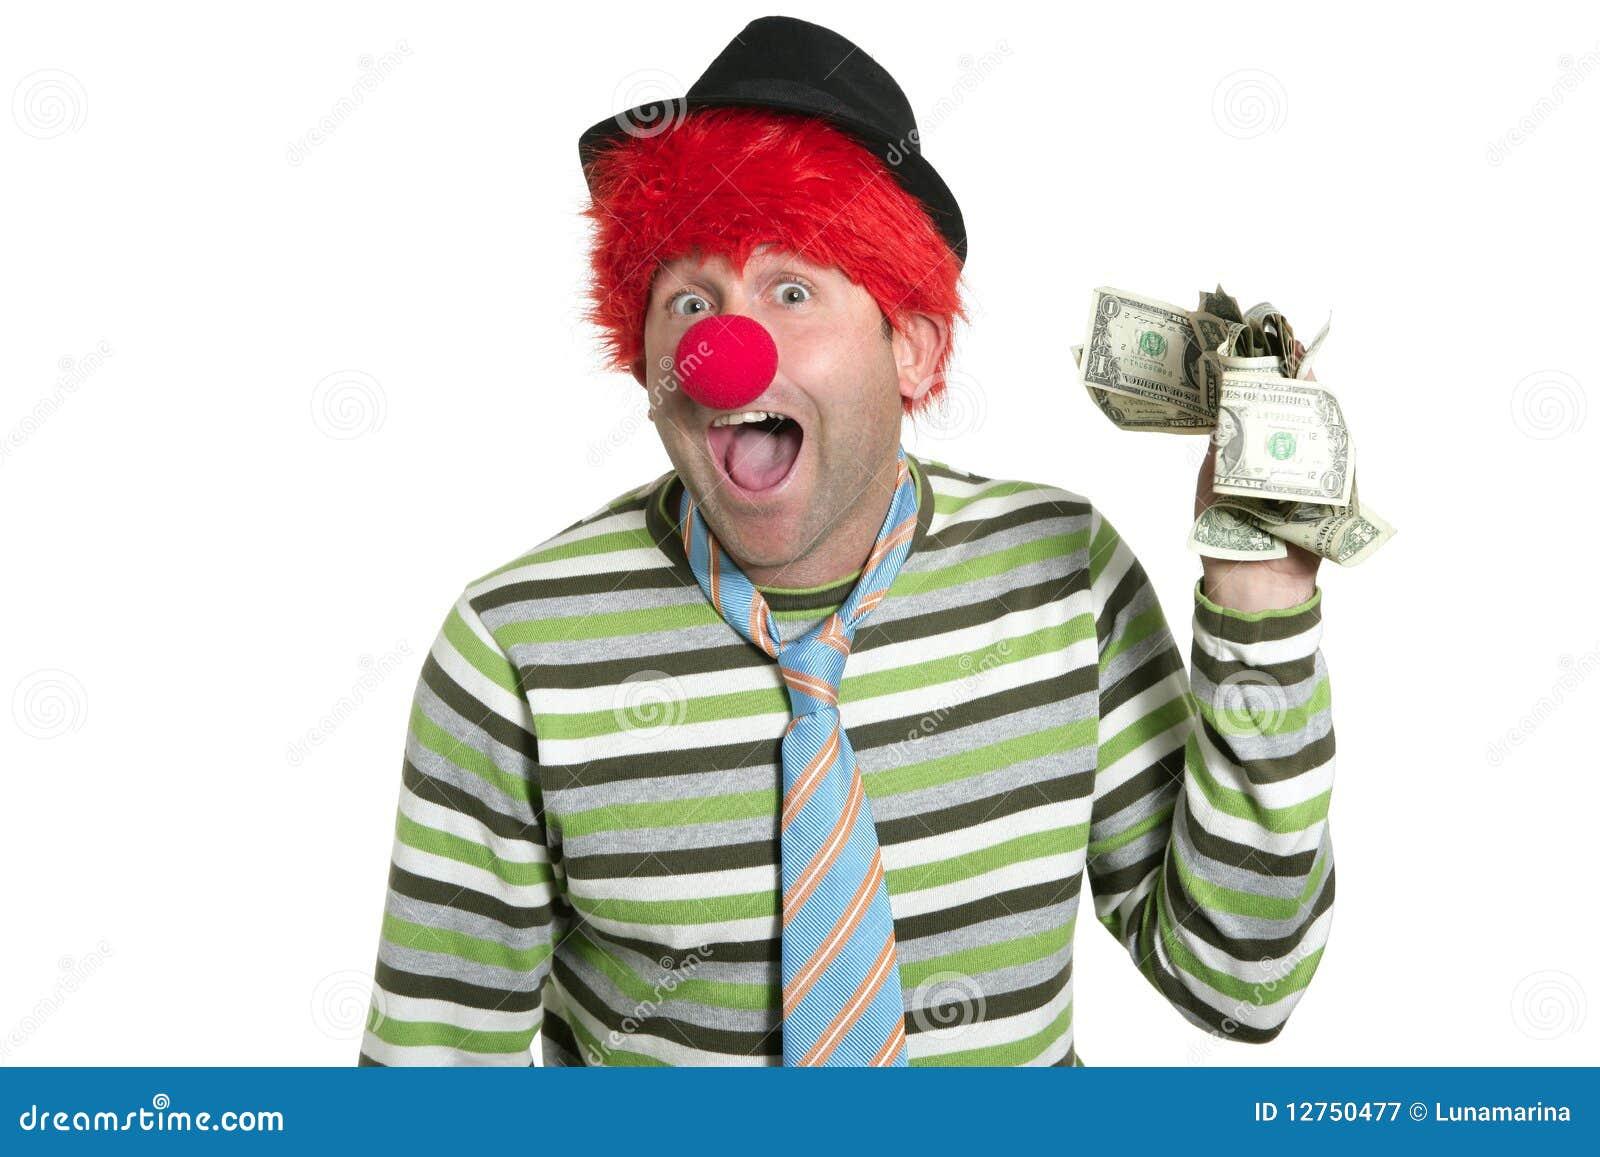 How to Start a Clowns Business